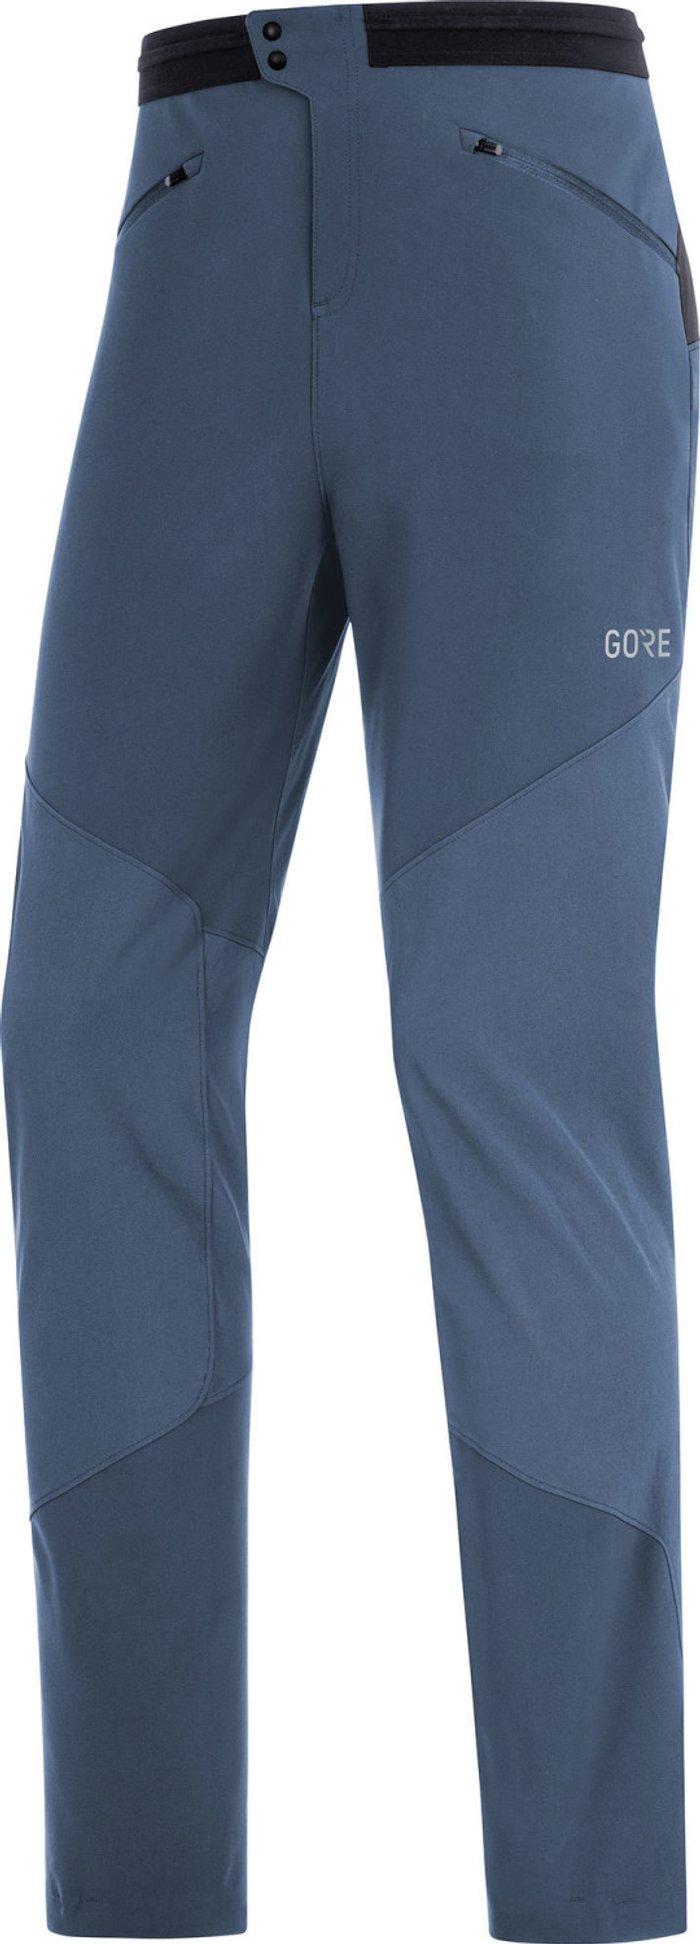 GORE Gore H5 Partial GTX I Pants deep water blue